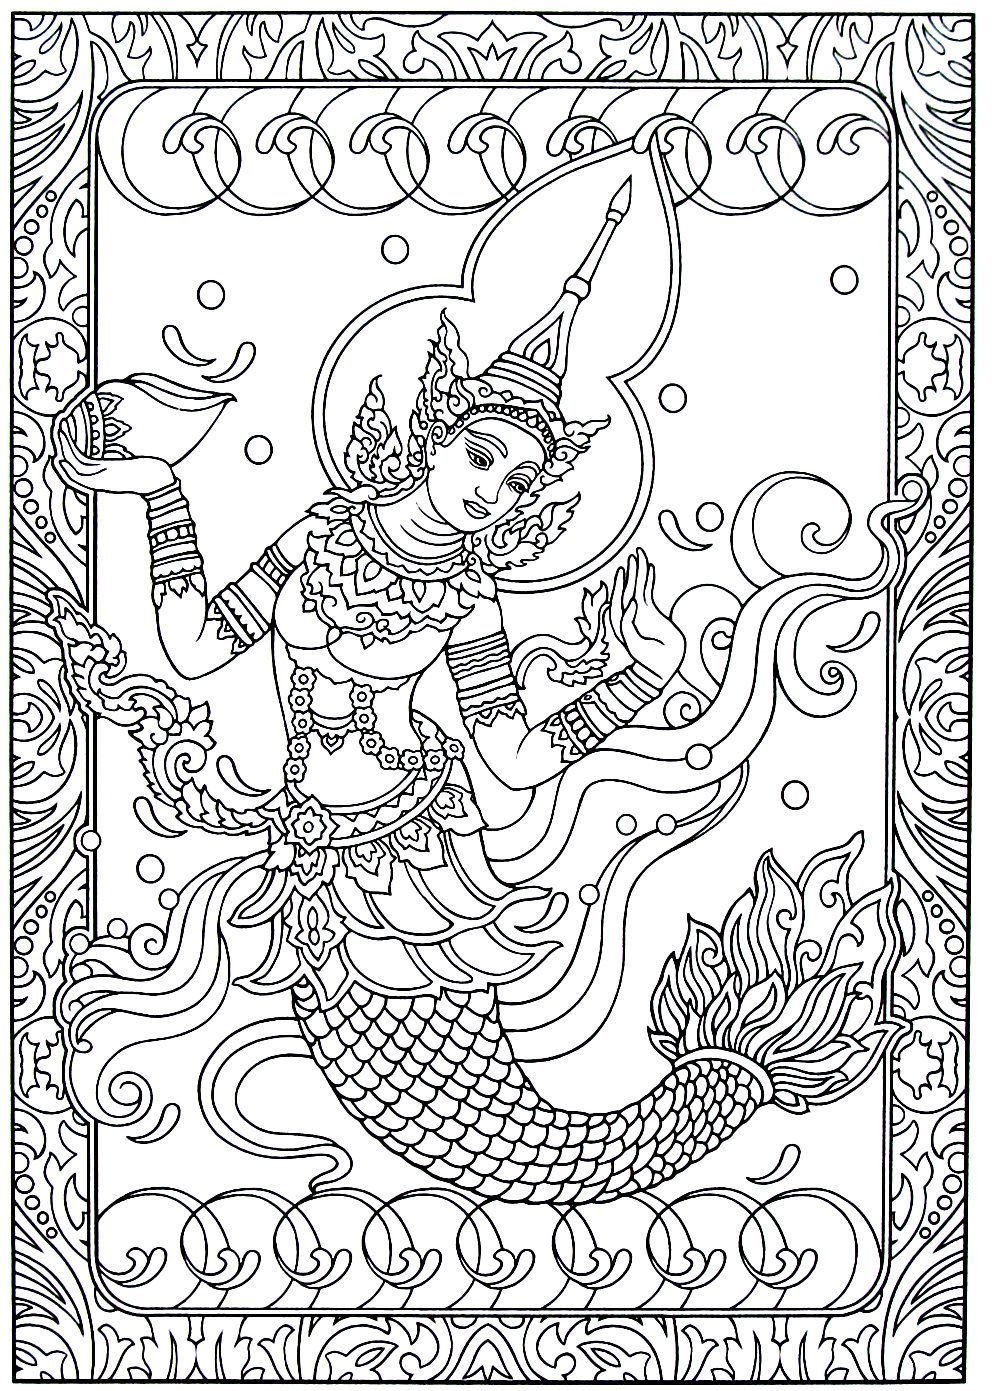 Mermaid Princess Supannamacha India And Thailand Culture Coloring Book Pages Animal Coloring Pages Coloring Books Coloring Book Pages